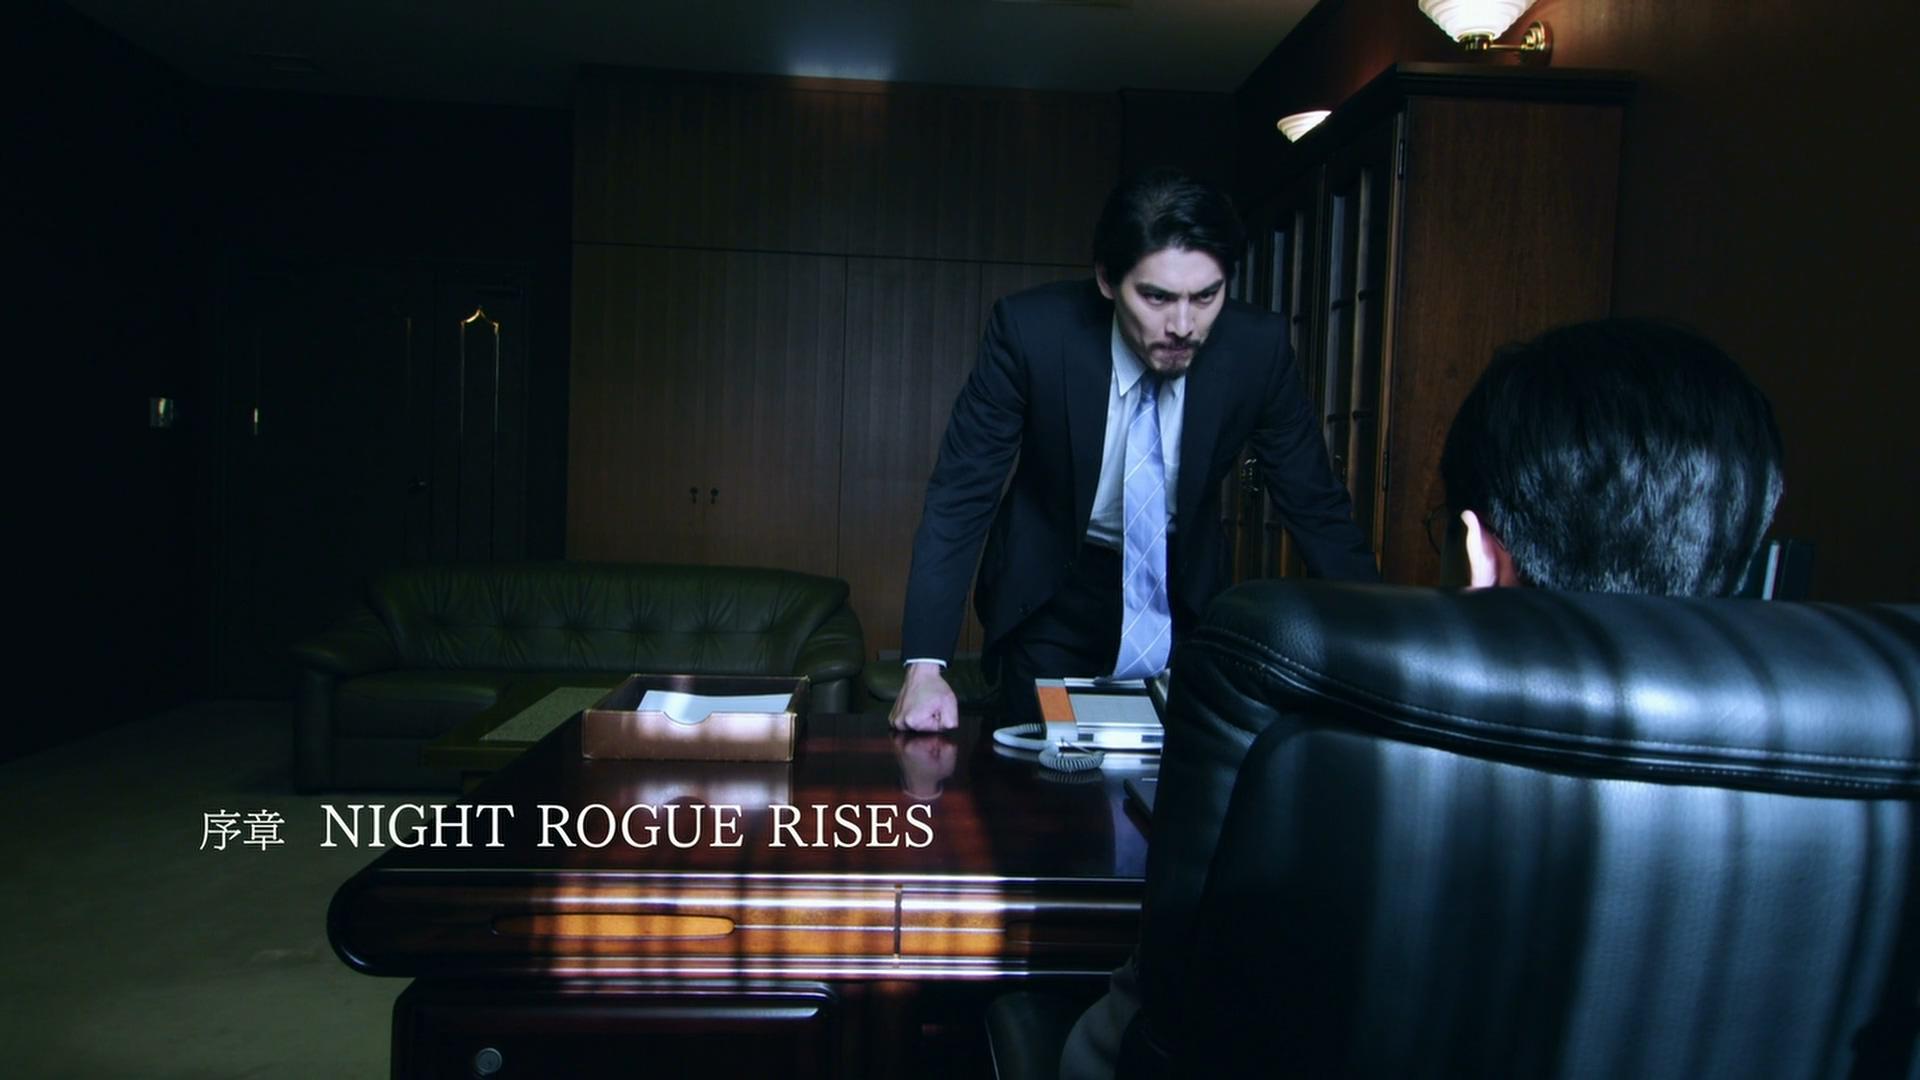 Prologue: NIGHT ROGUE RISES